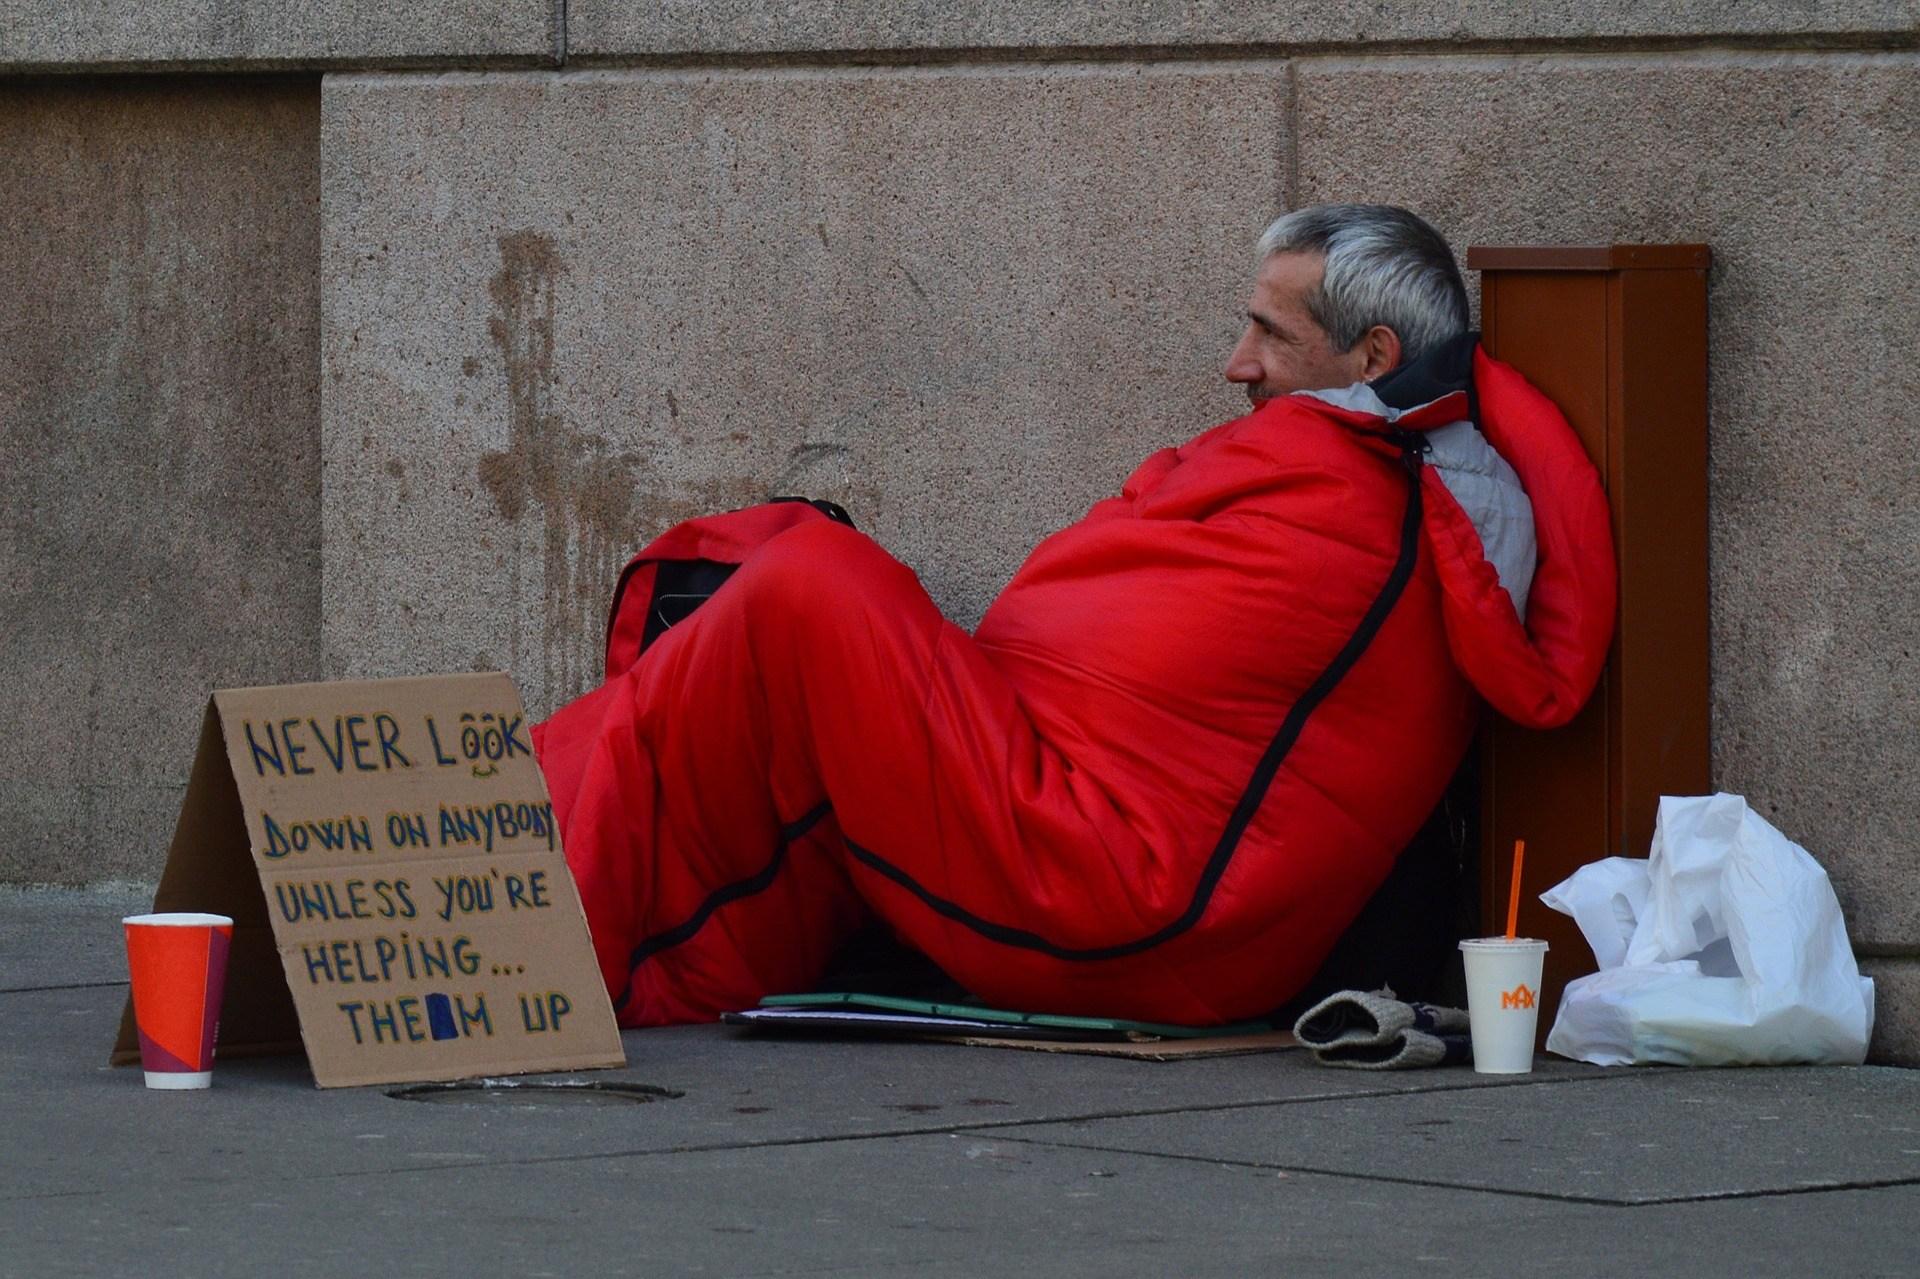 Homeless man in a sleeping bag.